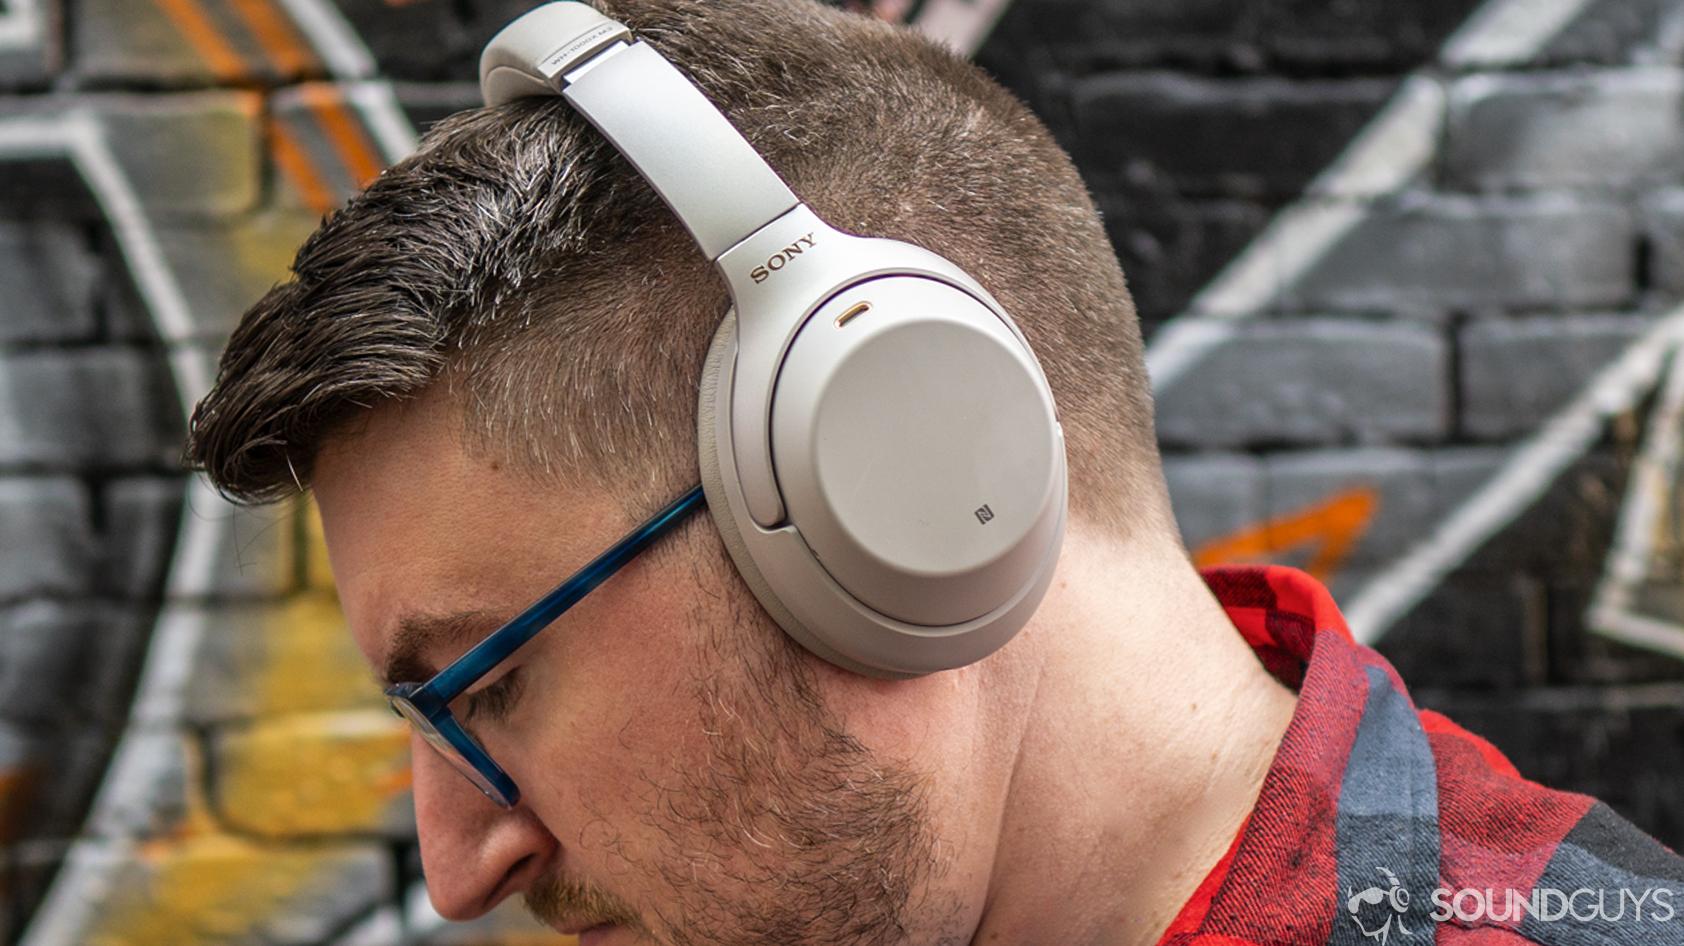 sony headphones wh 1000x m3 wear